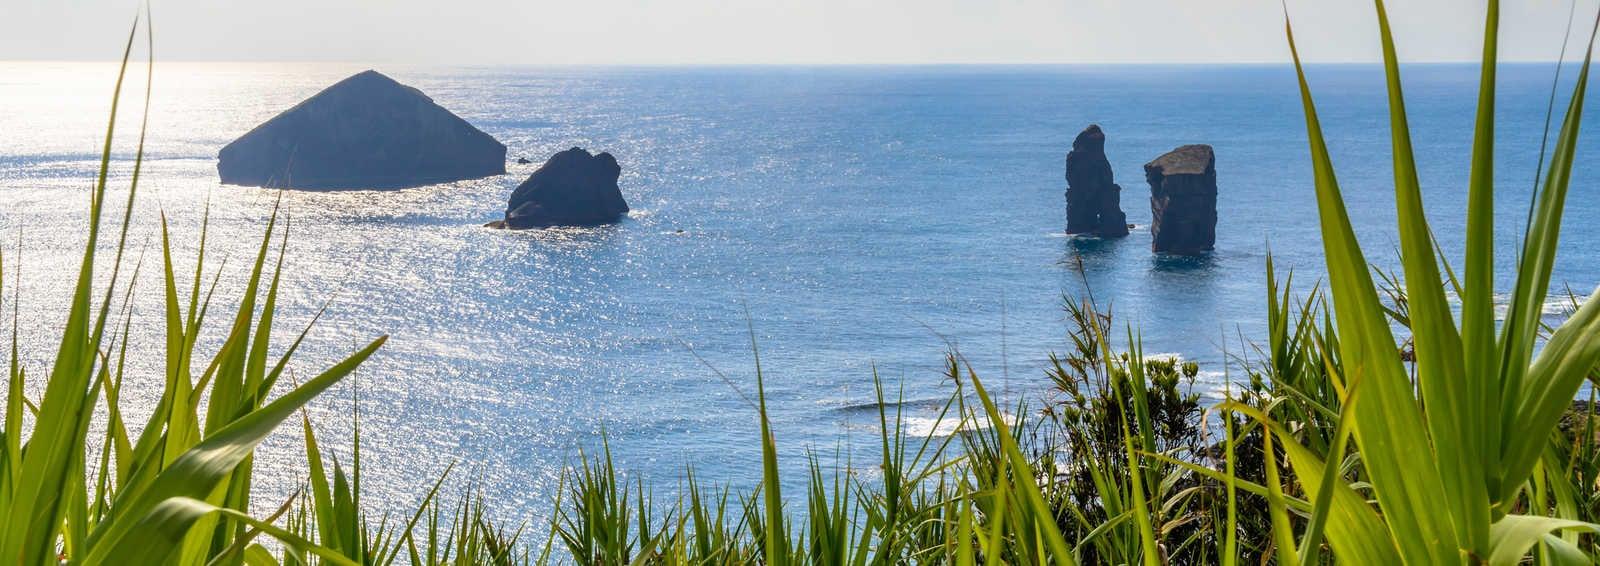 The coast of Sao Miguel, Azores